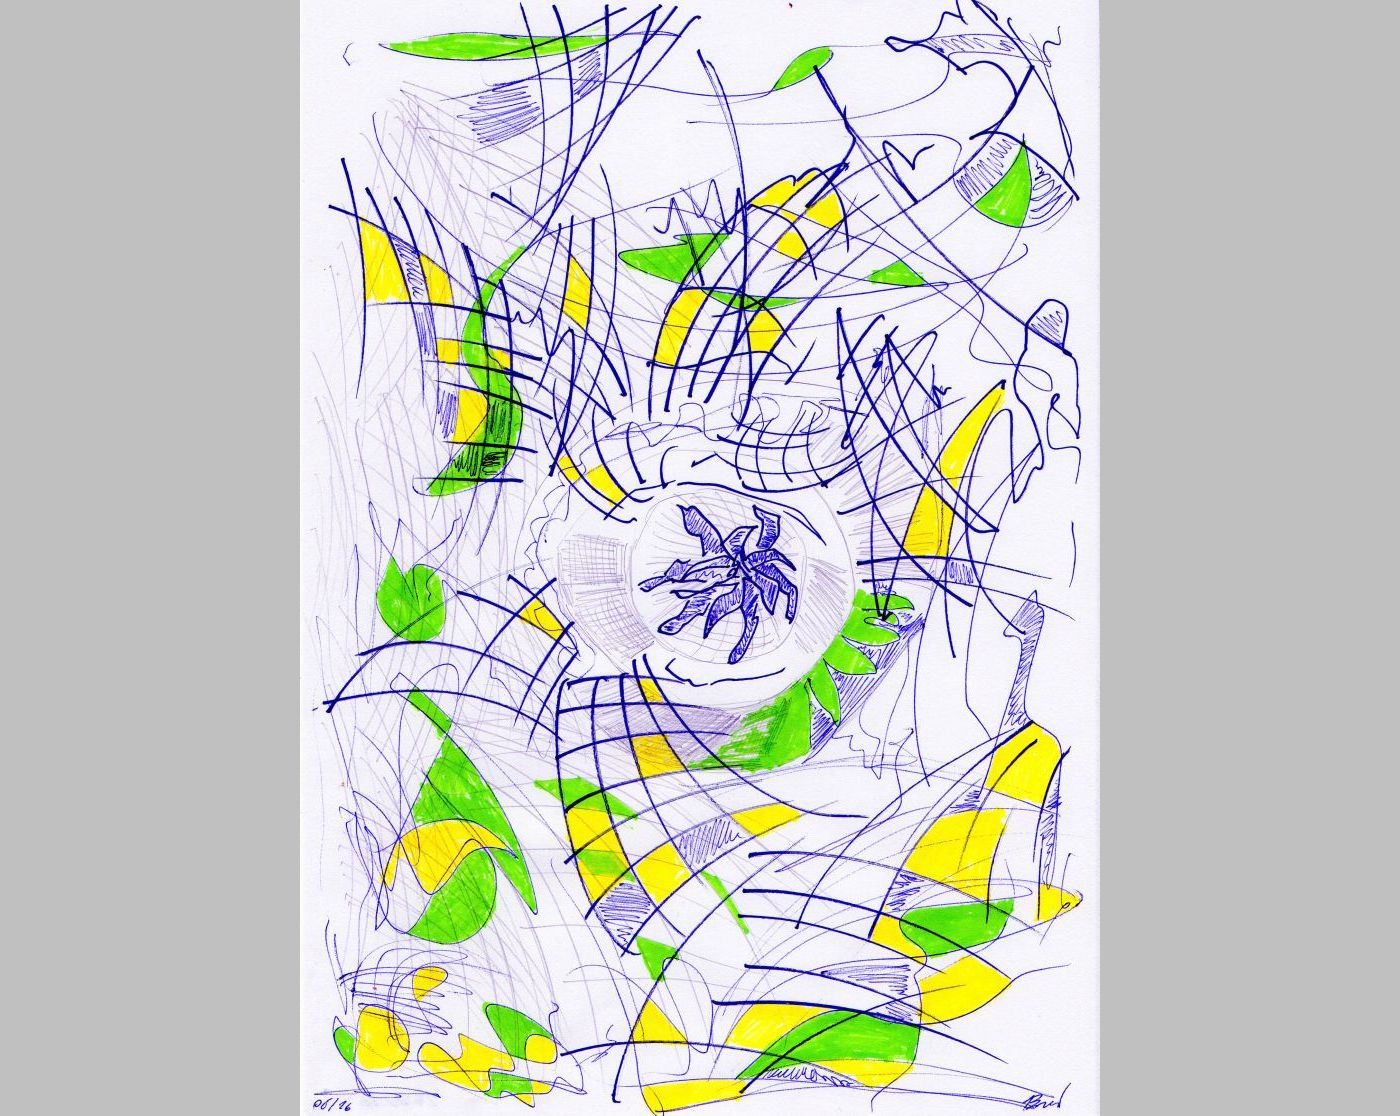 Ohne Titel (28.06.2016, 21 x 29,7 cm, A4)